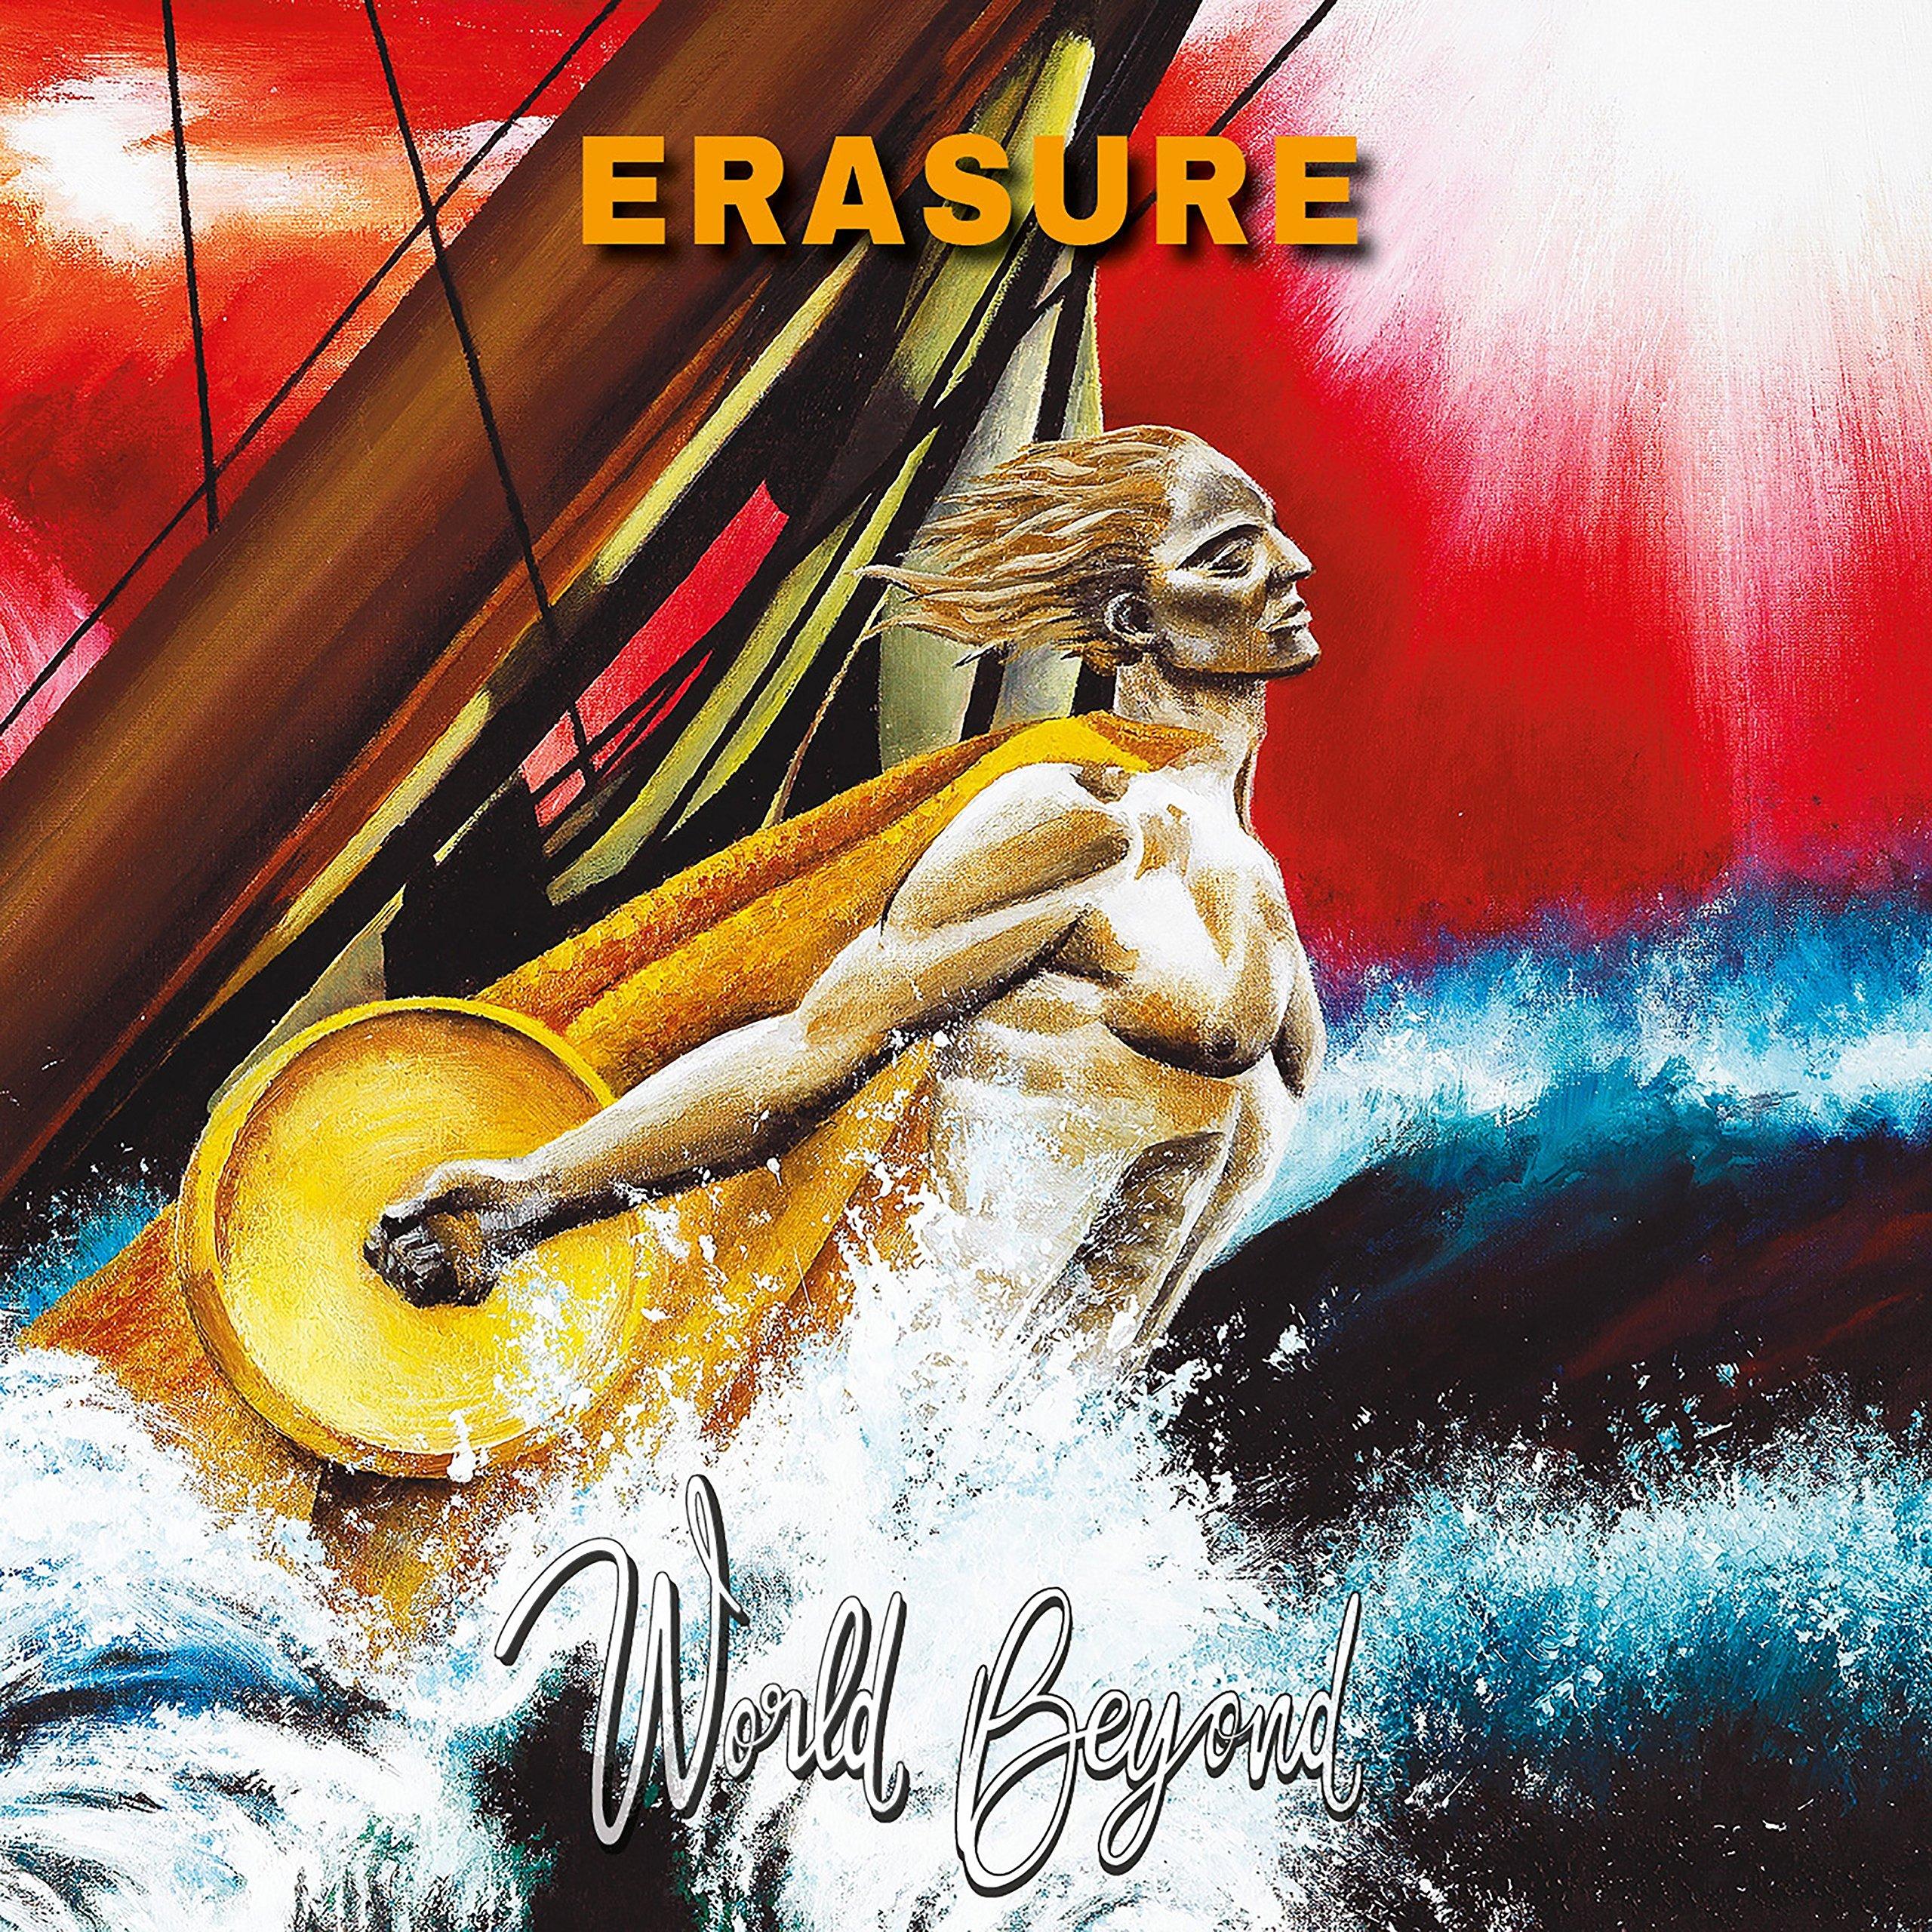 Erasure - World Beyond (LP Vinyl)